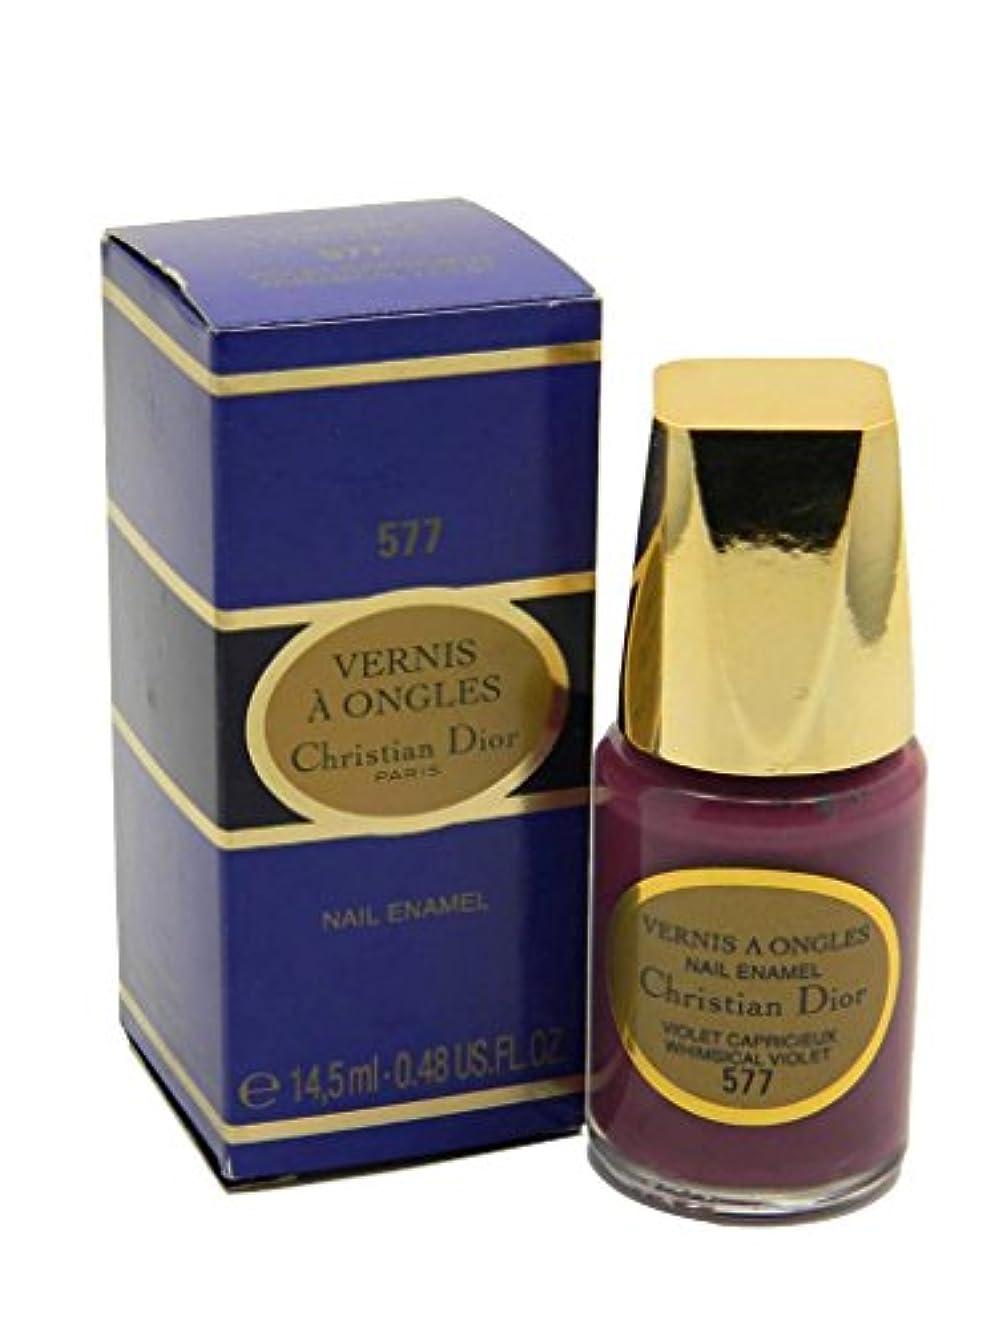 Dior Vernis A Ongles Nail Enamel Polish 577 Whimsical Violet(ディオール ヴェルニ ア オングル ネイルエナメル ポリッシュ 577 ウィムジカル バイオレット...